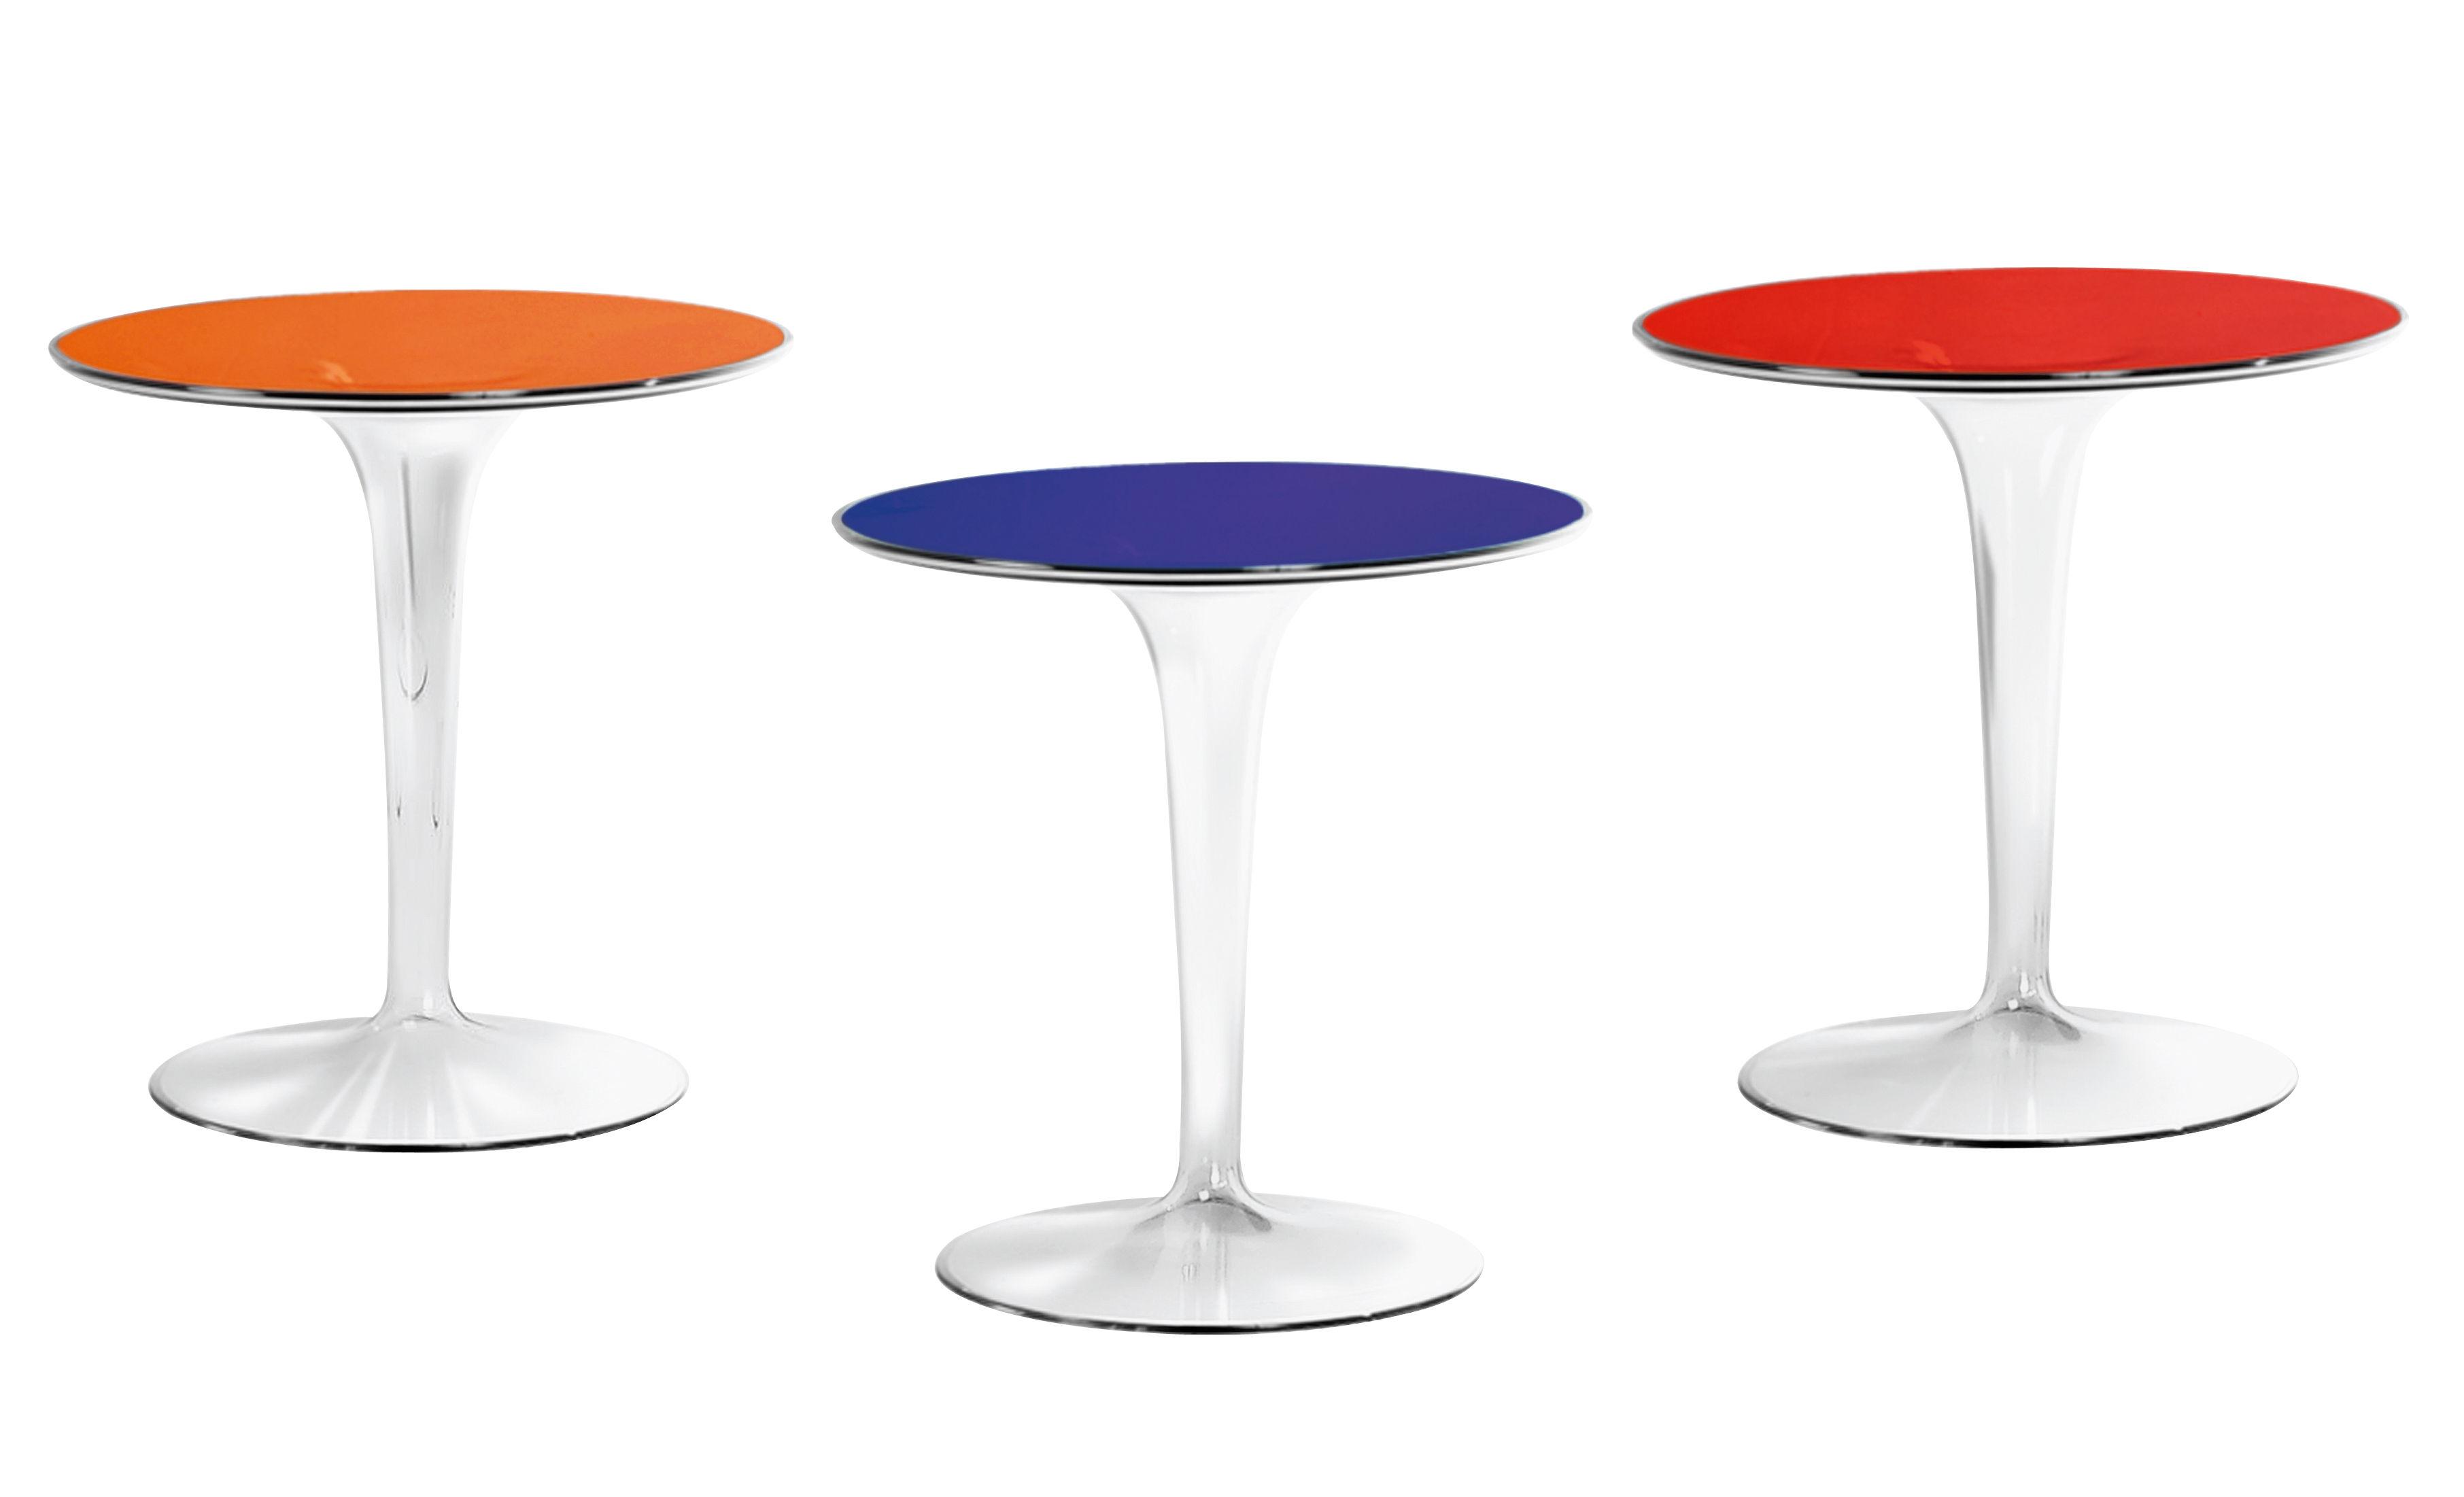 table d 39 appoint tip top plateau pmma rouge pied cristal kartell. Black Bedroom Furniture Sets. Home Design Ideas